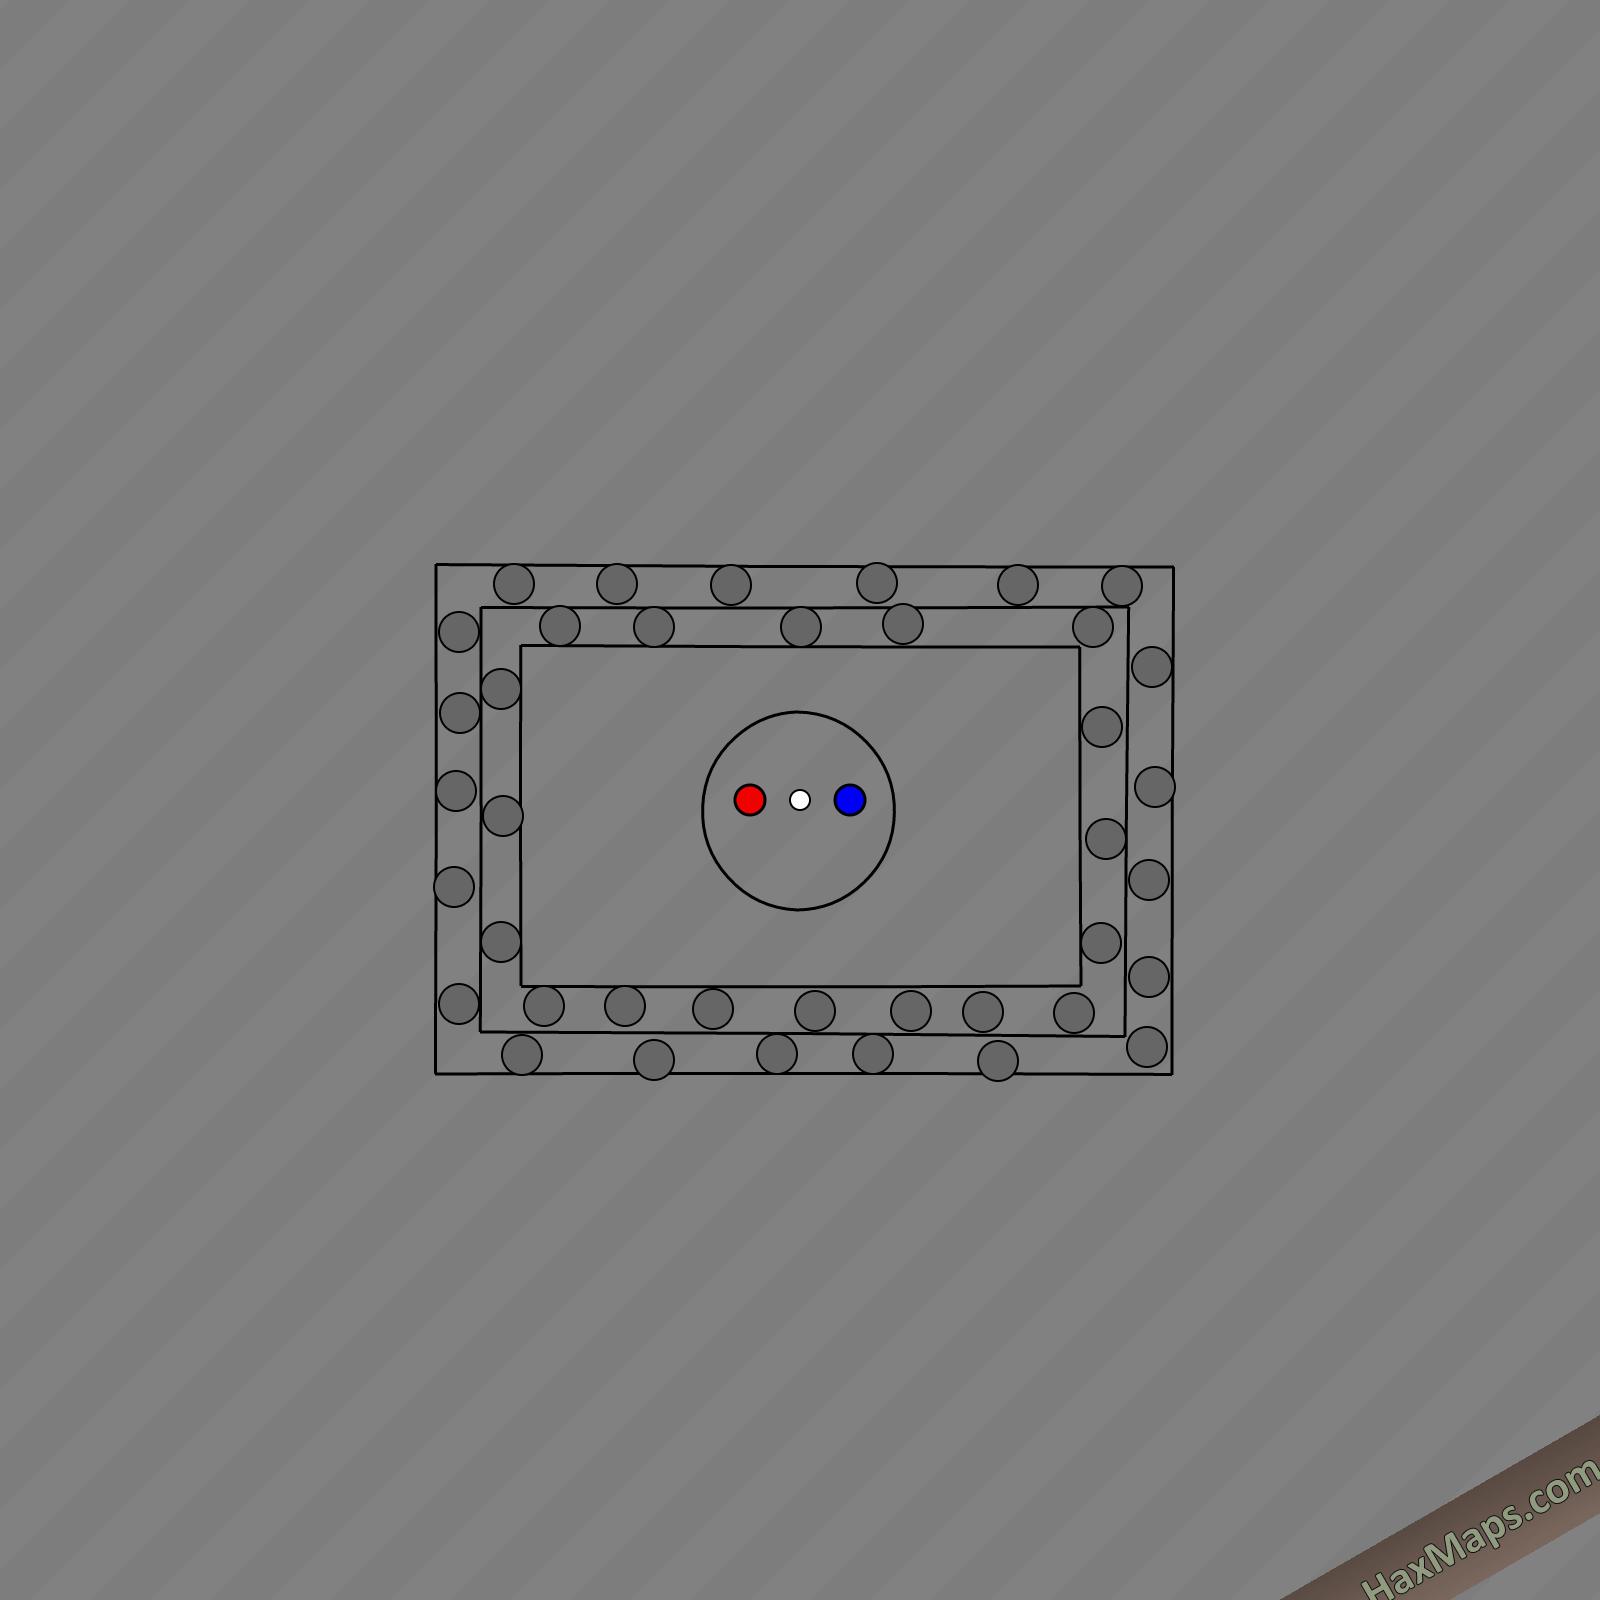 hax ball maps | Sumo